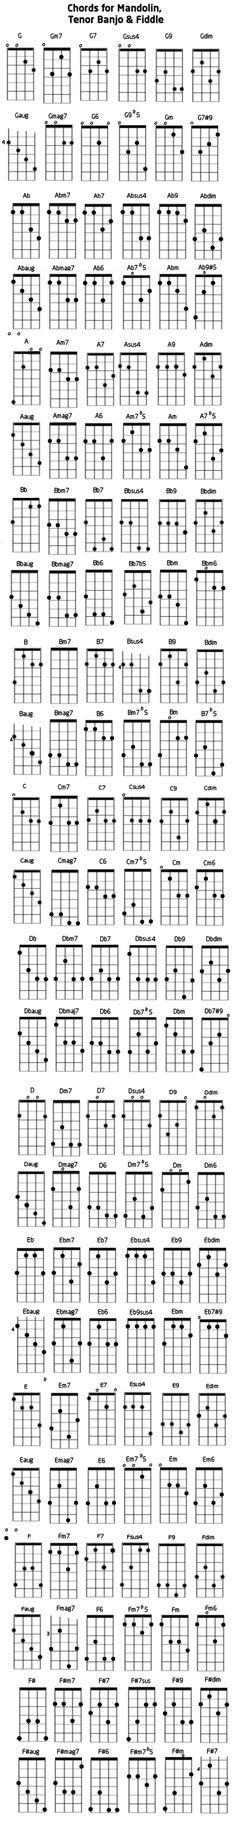 74 Best Mandolin Images On Pinterest Mandolin Lessons Instruments